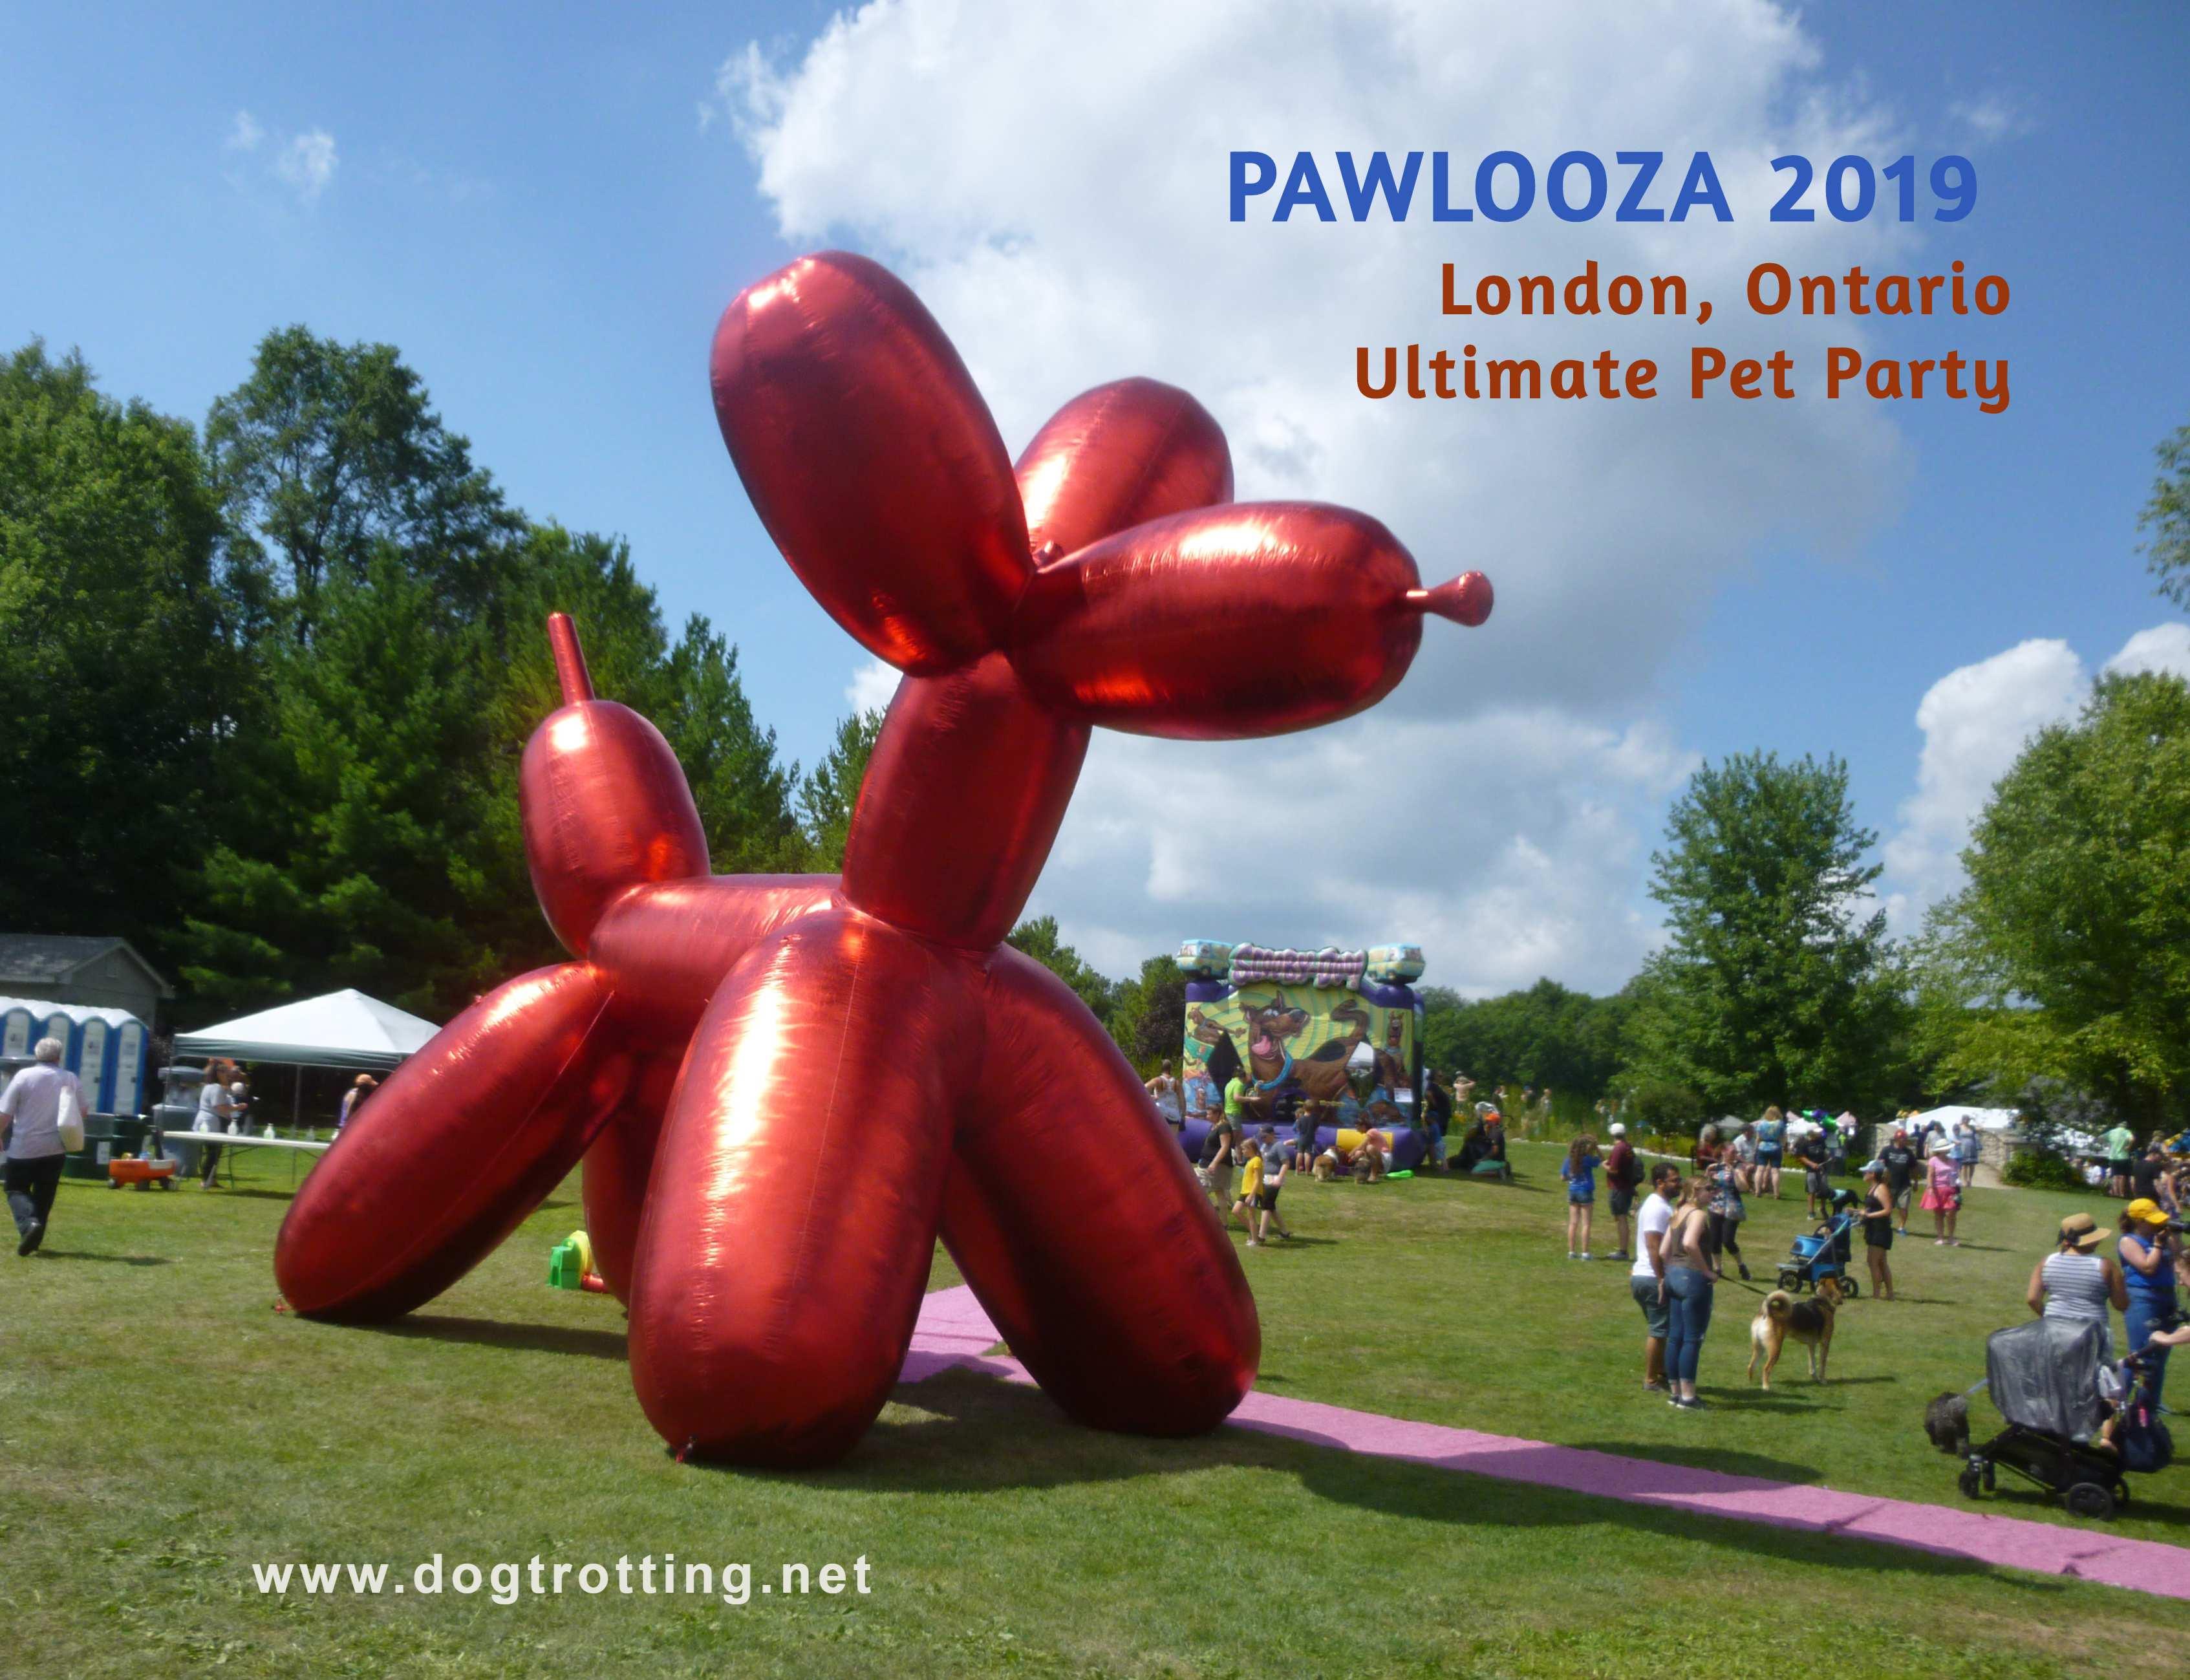 big red dog balloon at Pawlooza 2019 dog festival